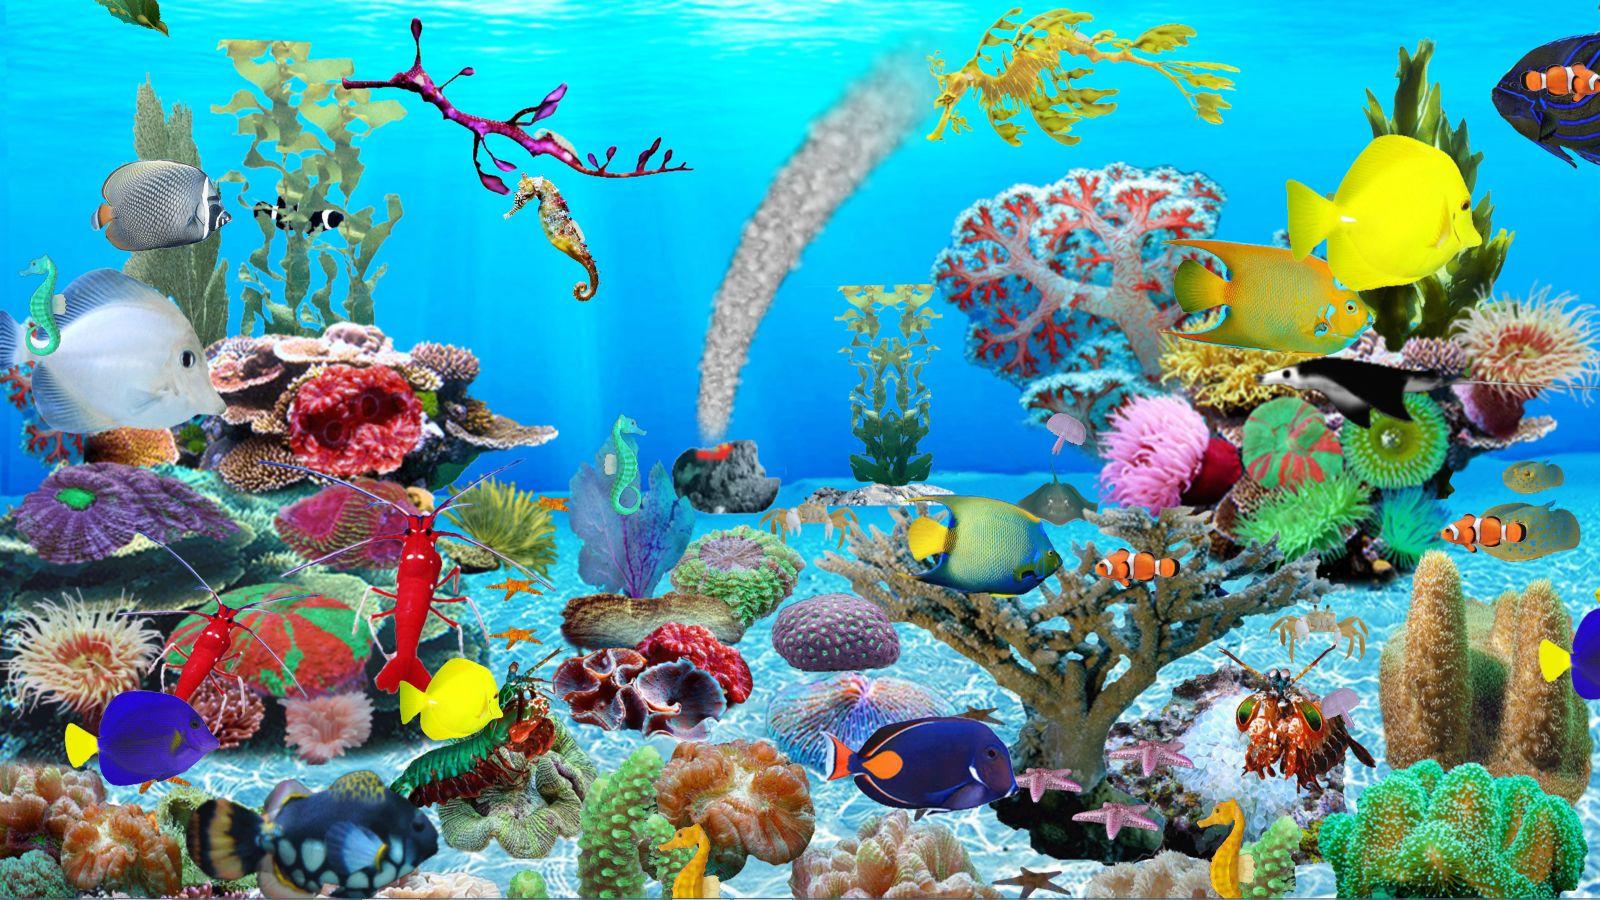 Fond D Ecran Pc Aquarium Gratuit Anime 1600x900 Wallpaper Teahub Io